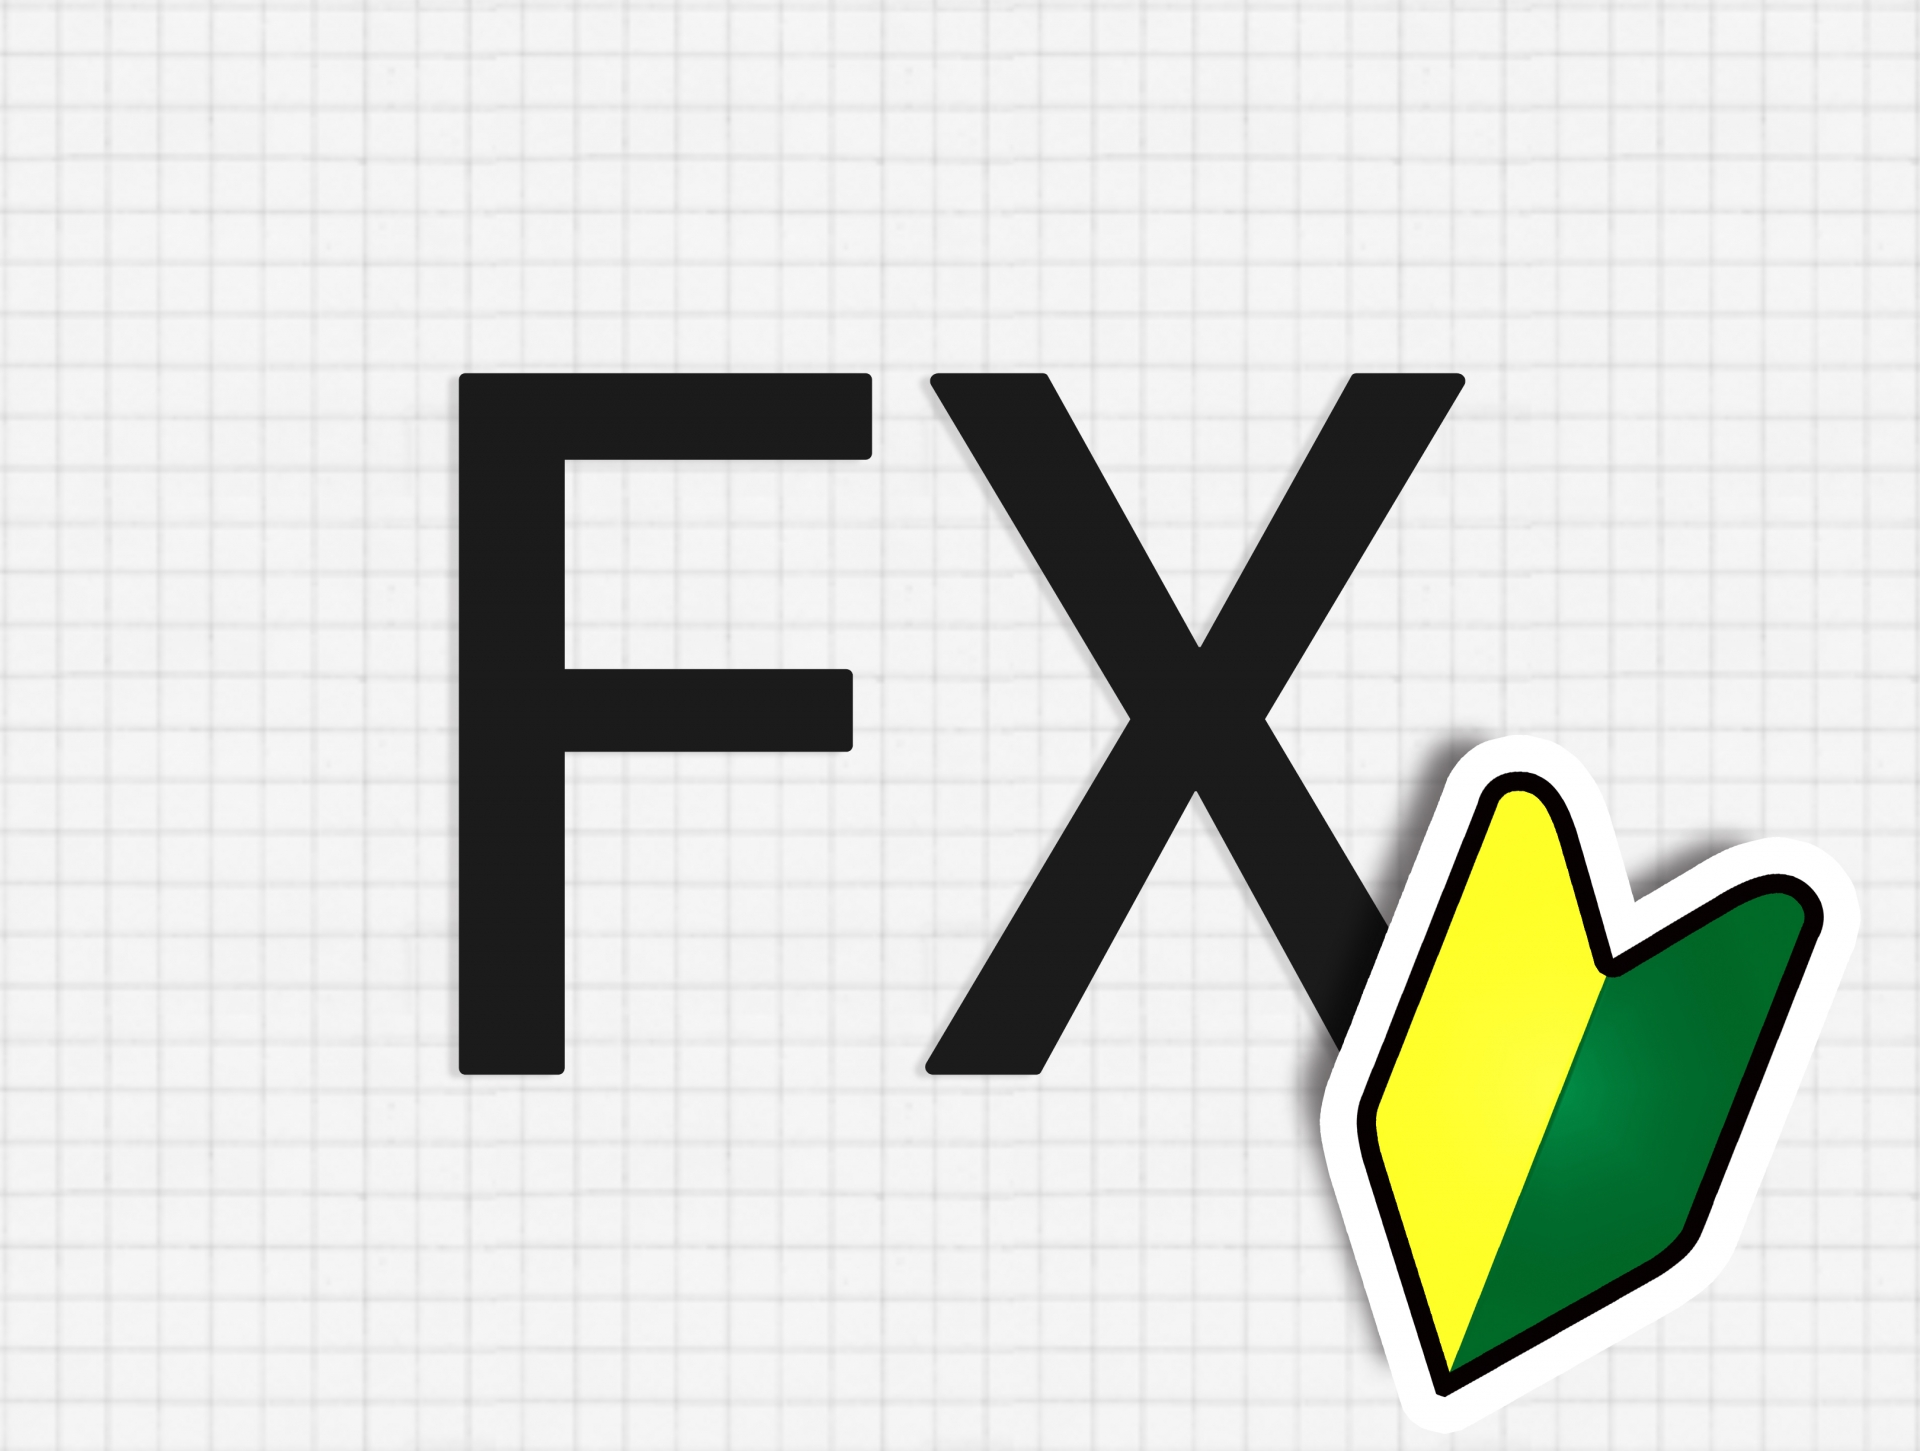 FX初心者向けの入門講座!基礎知識を徹底解説